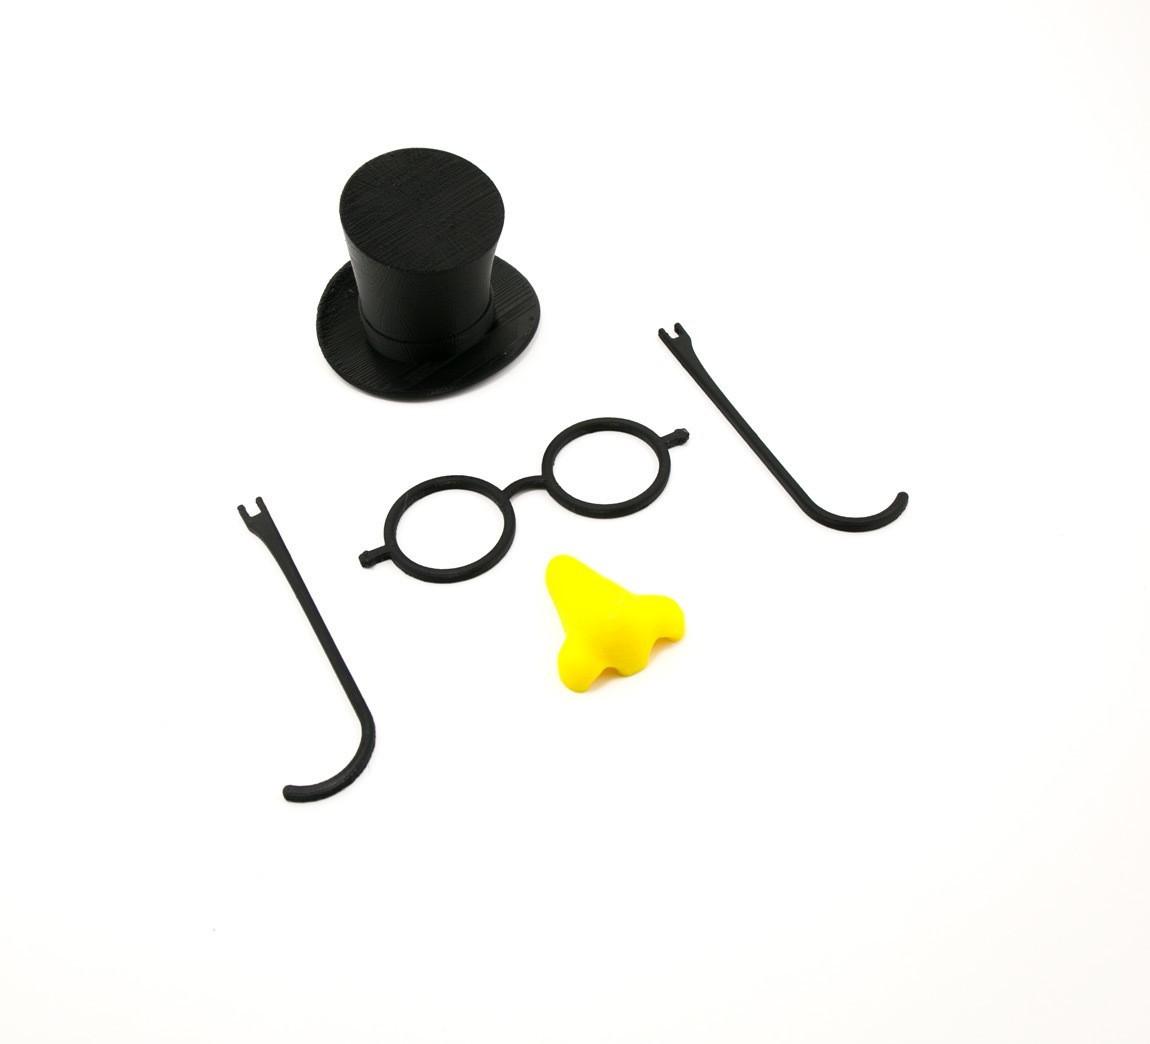 b2d53a5a402bd24a940379ae37ff2716_1450489048936_NMD000907-12.jpg Download free STL file Snowman Decorating Kit • 3D printable model, FerryTeacher